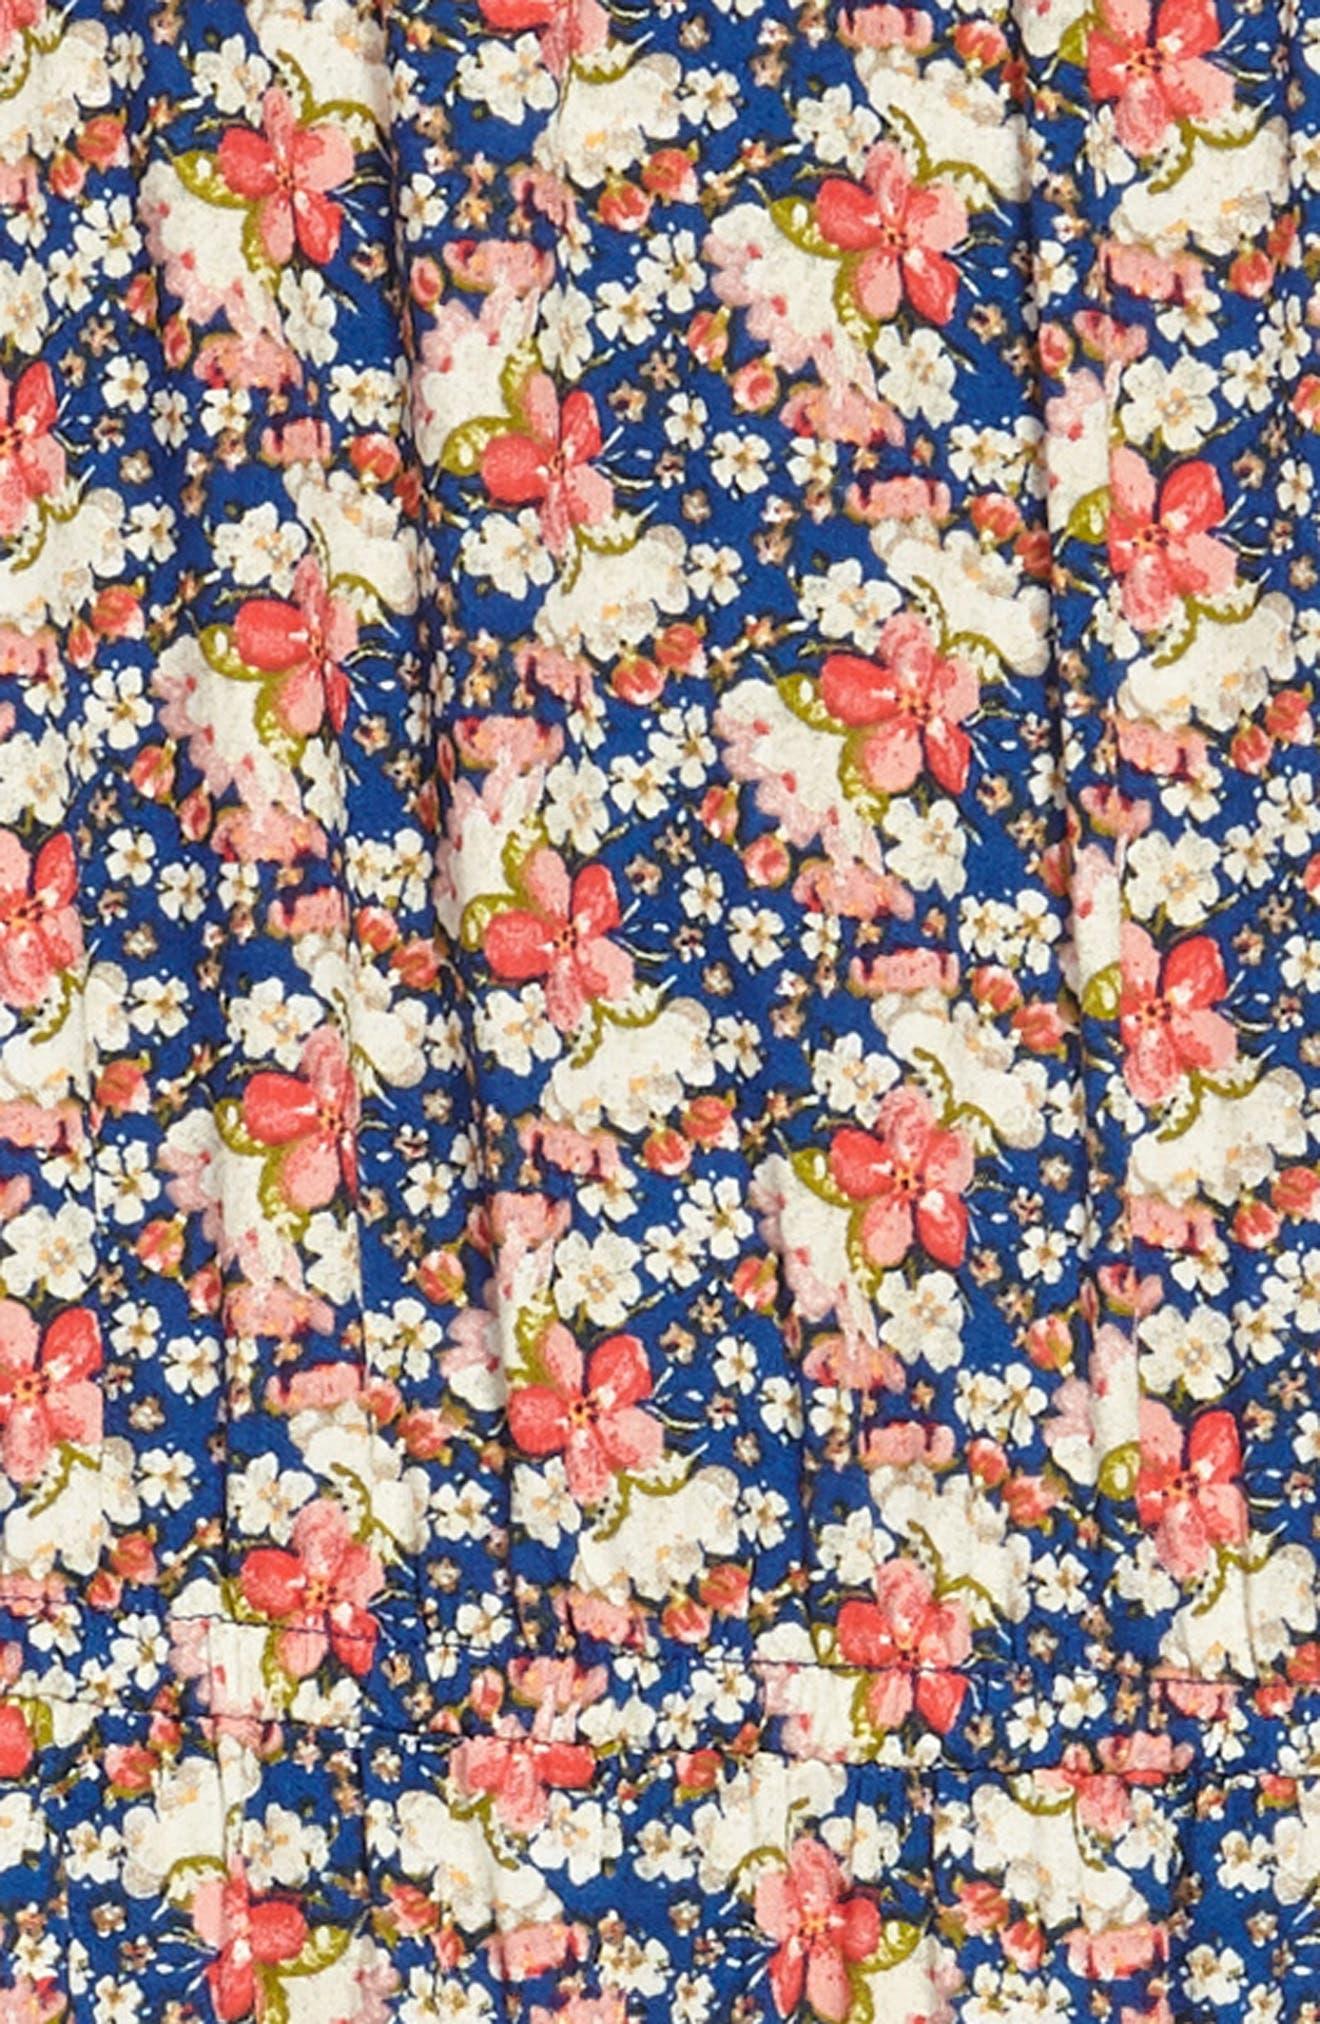 Floral Print Halter Dress,                             Alternate thumbnail 3, color,                             400